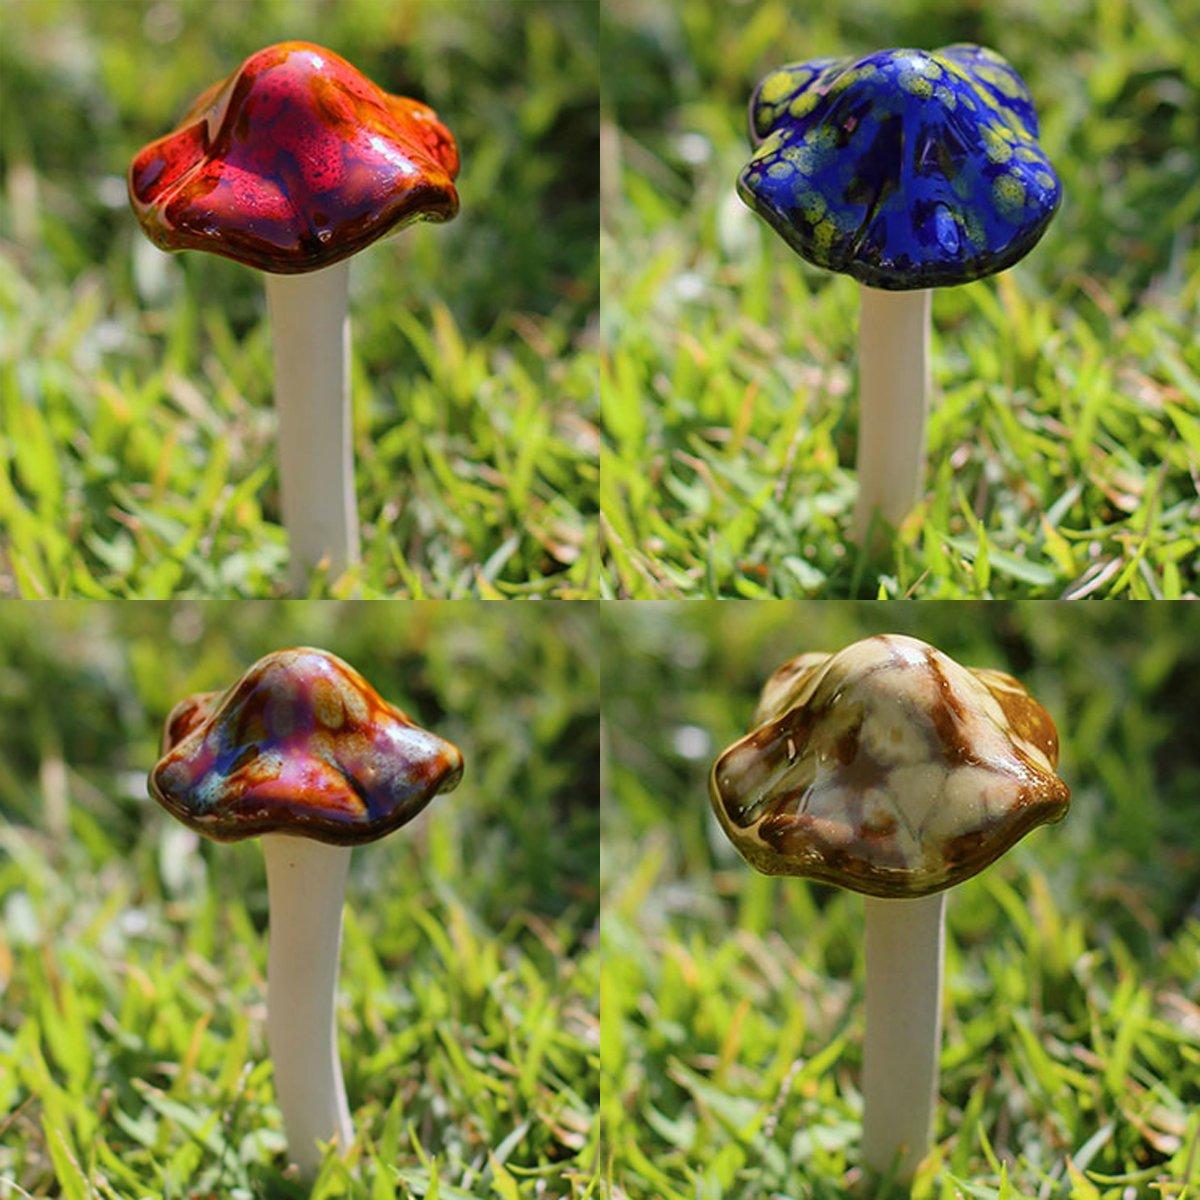 Amazon.com : Aigel Ceramic Mushrooms Figurine Garden Decor, Garden ...